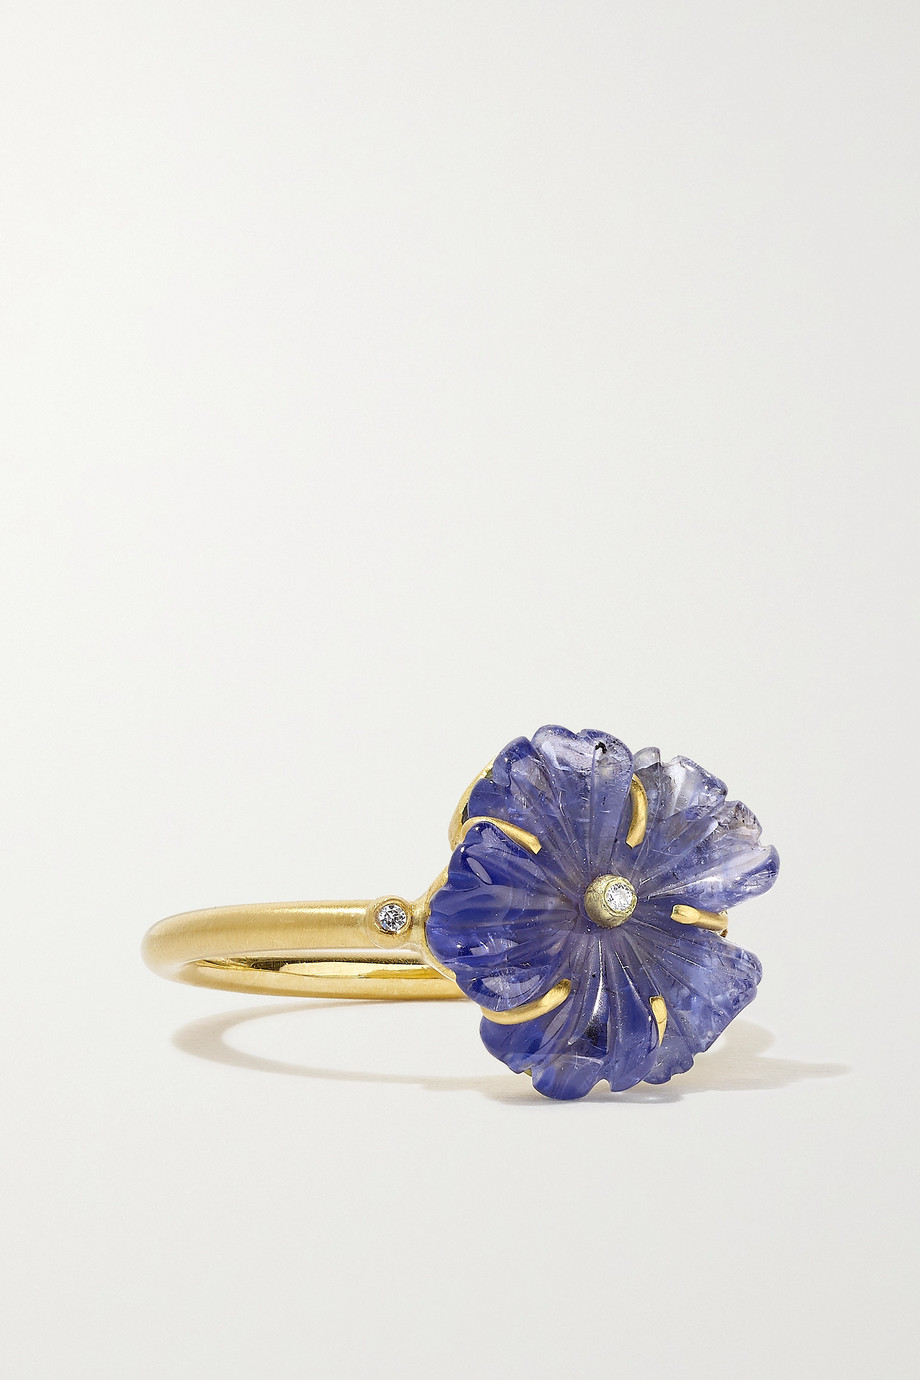 Brooke Gregson Blossom 18-karat gold, tanzanite and diamond ring